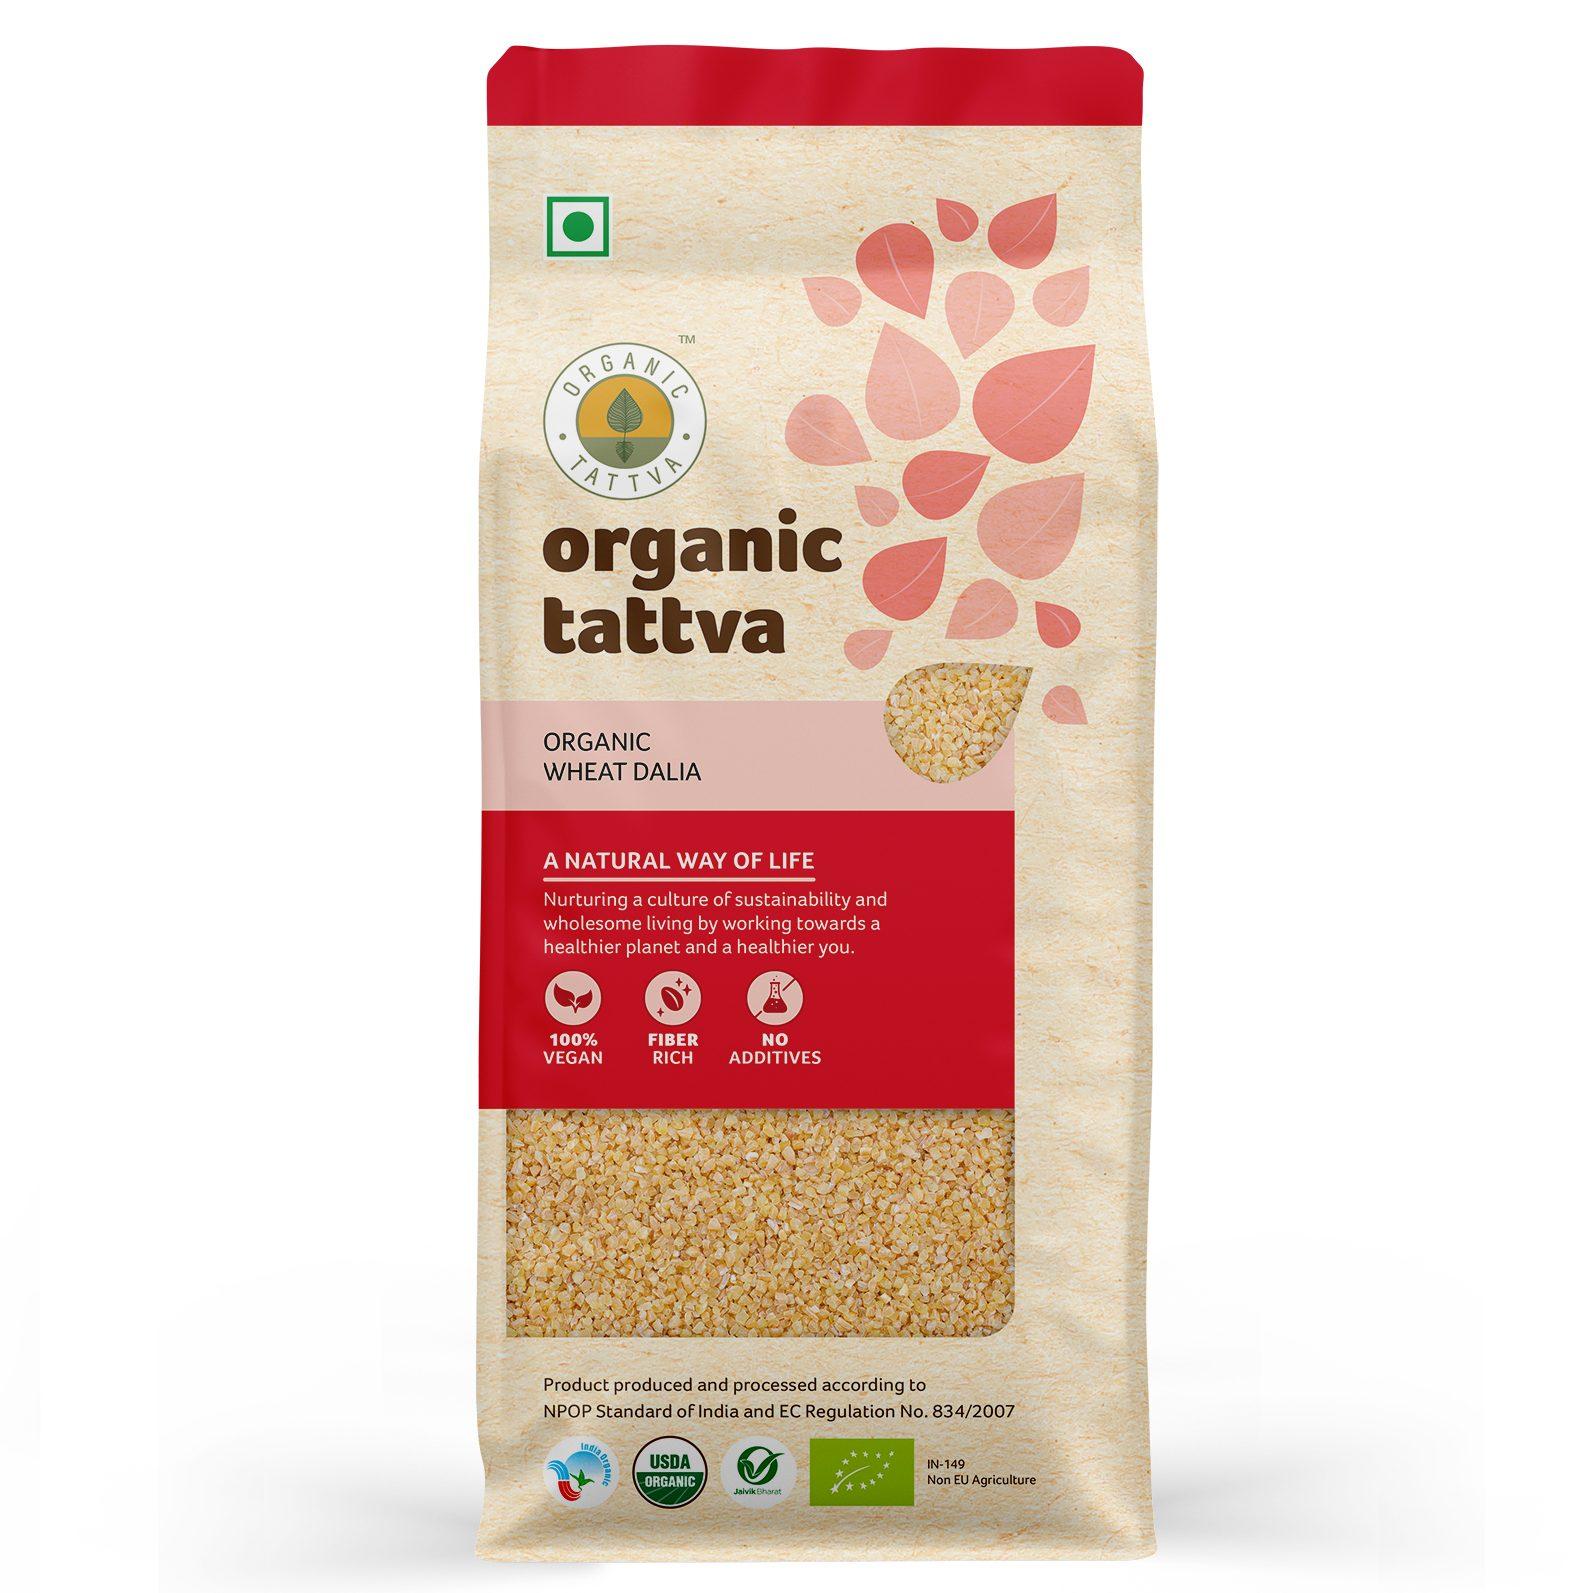 Organic Tattva Organic Wheat Dalia